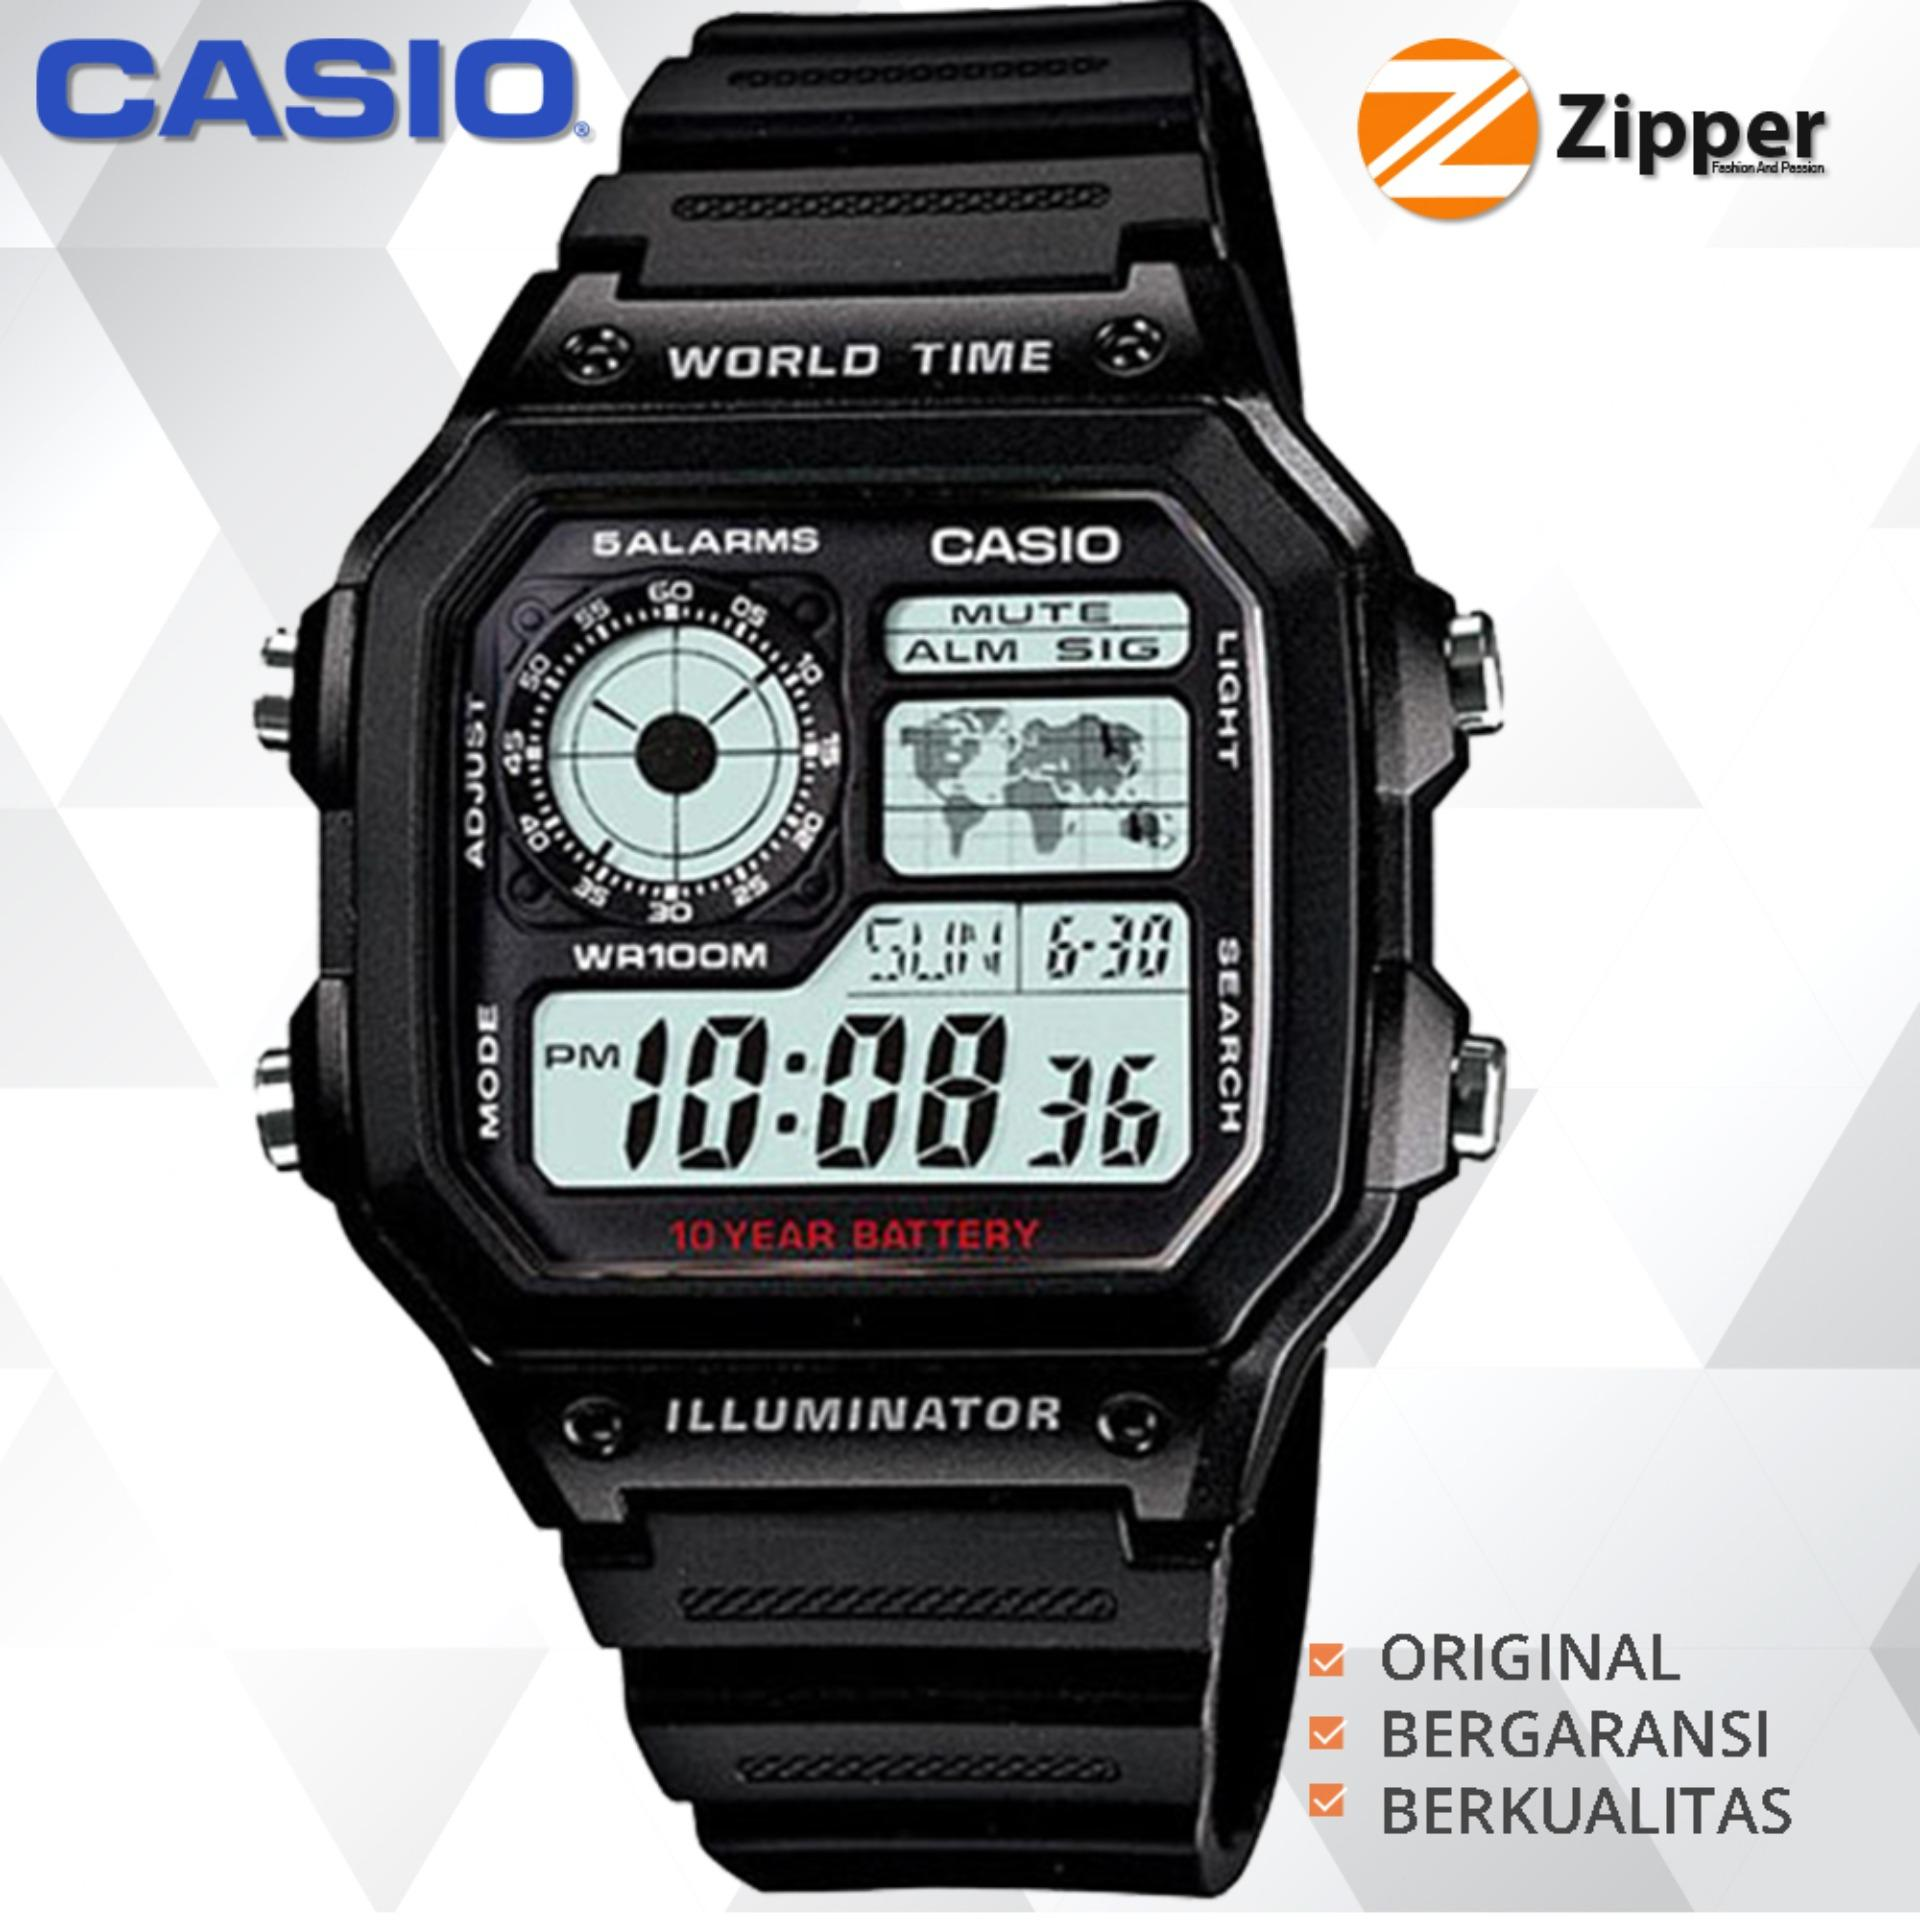 Casio Illuminator Jam Tangan Digital AE-1200WH-1AVDF Youth Series - Tali Resin